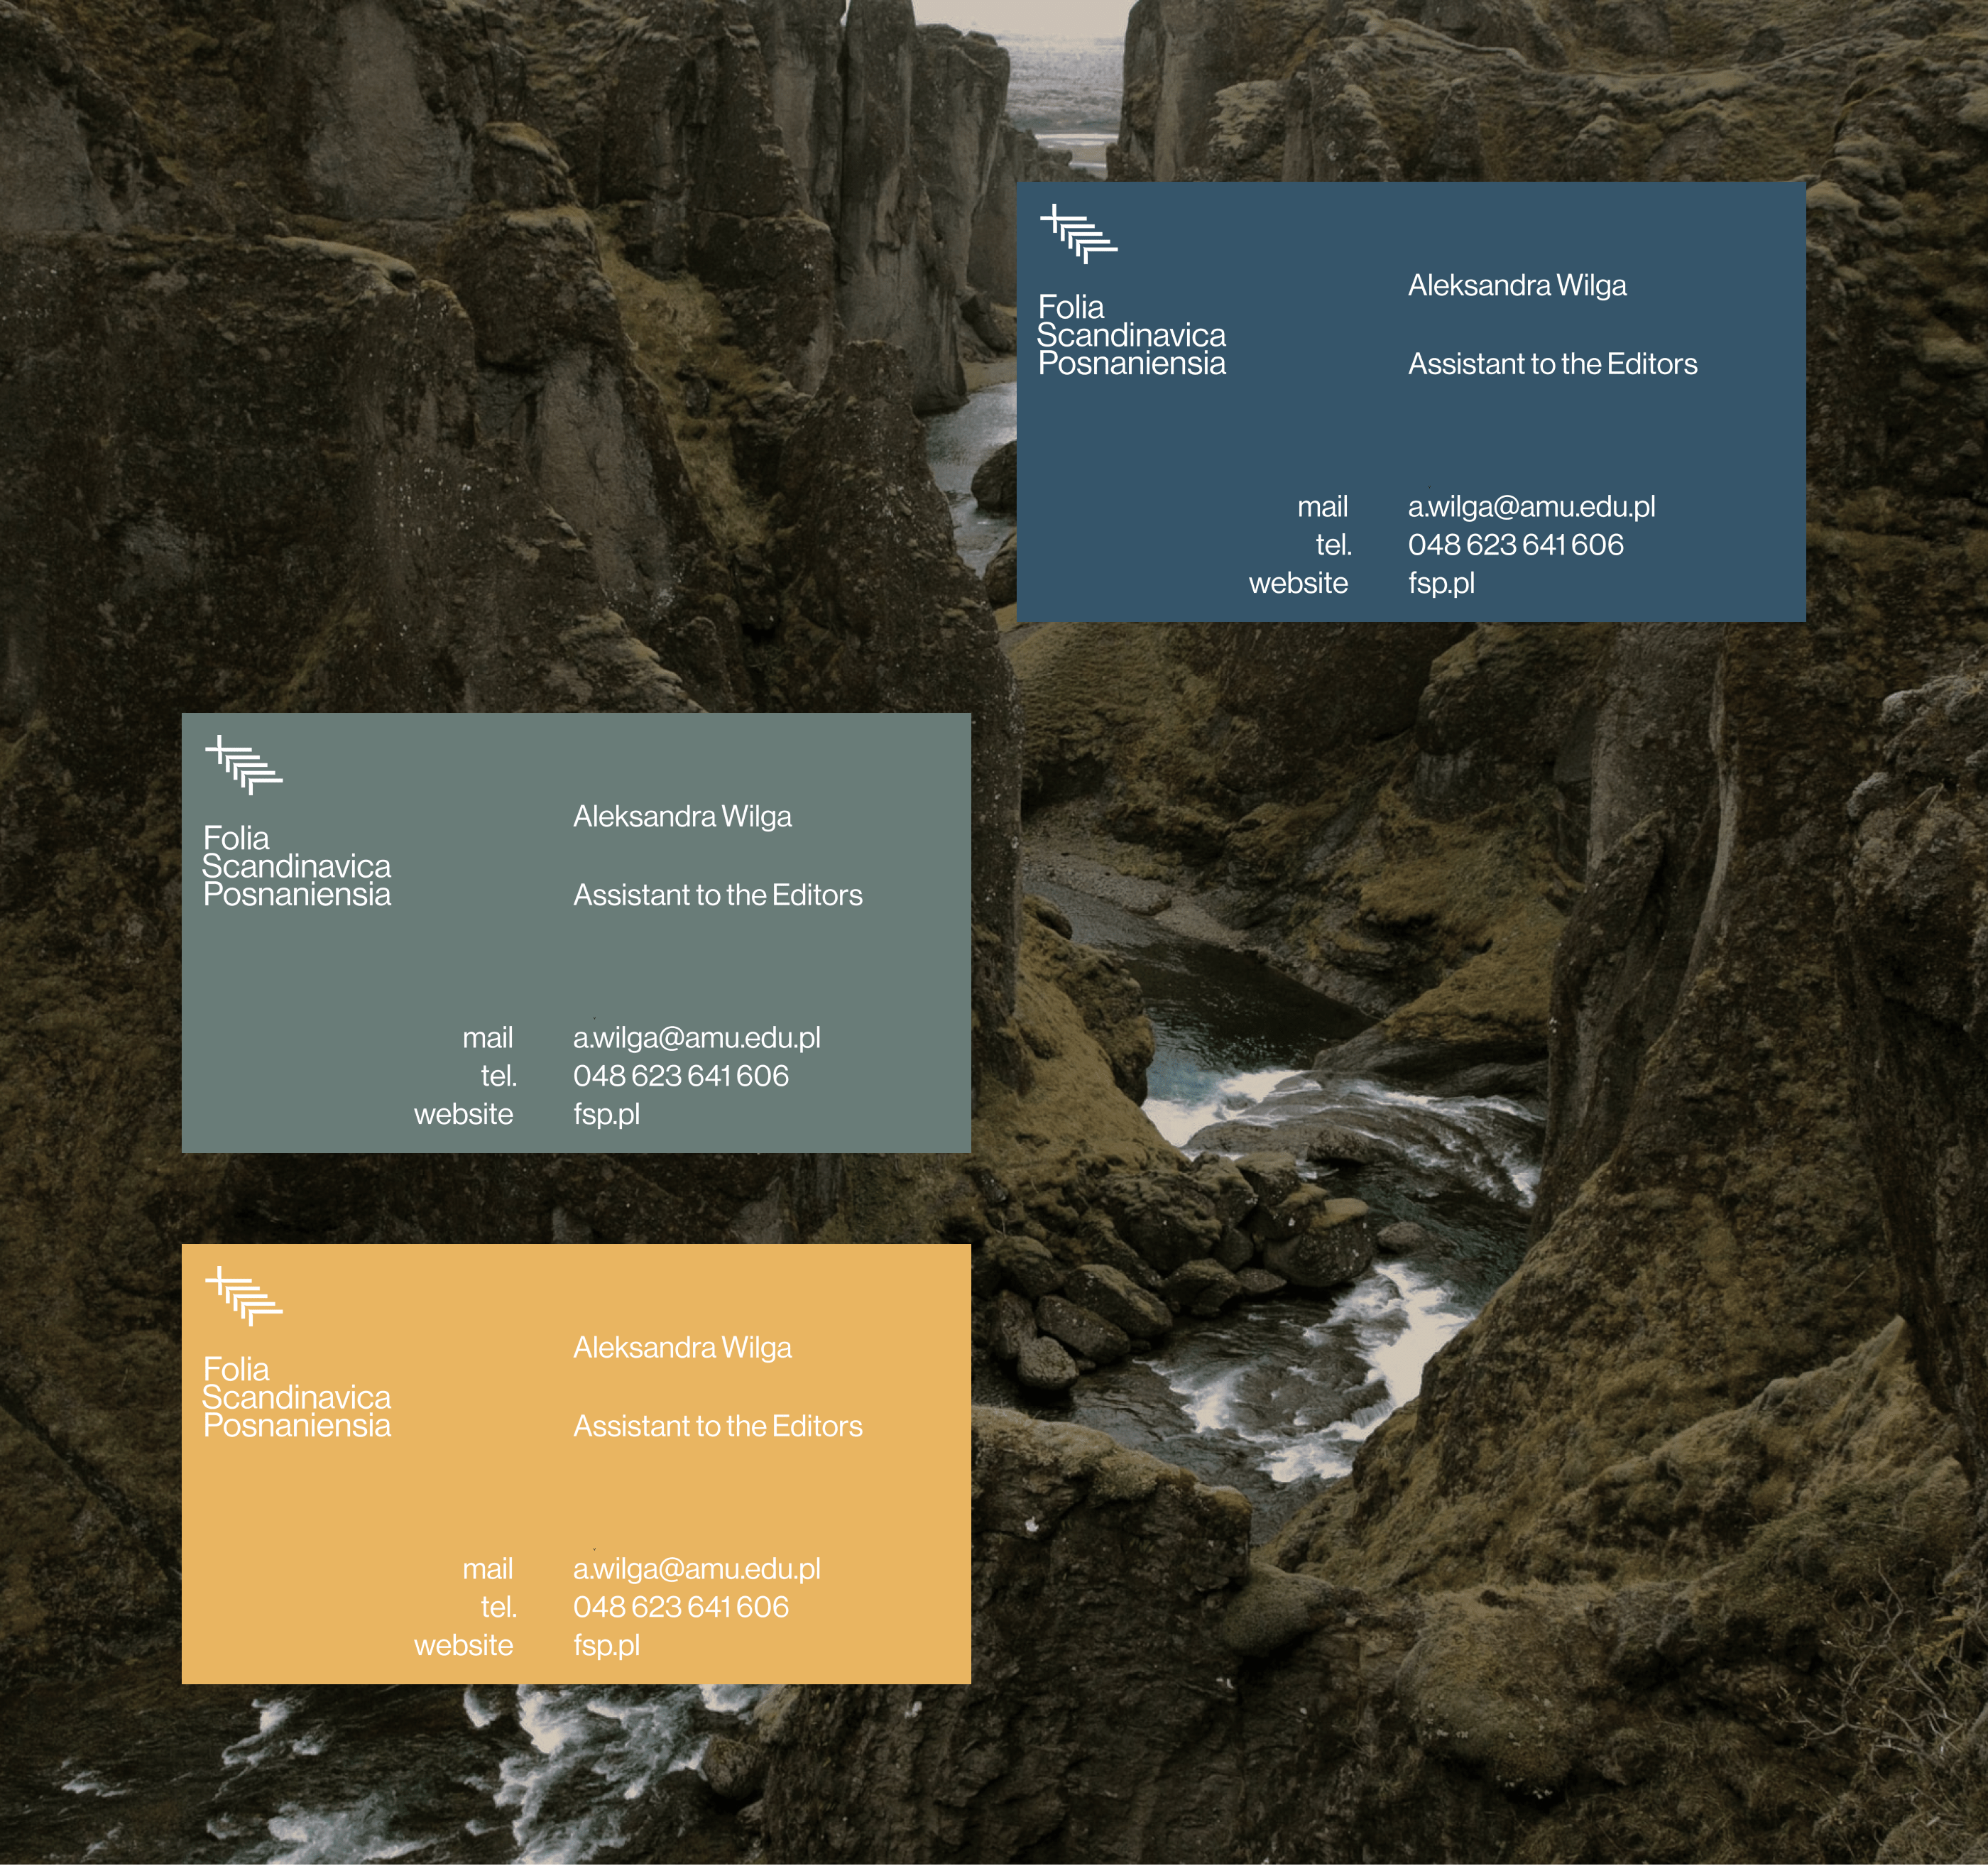 Business cards - Folia Scandinavica Posnaniensia